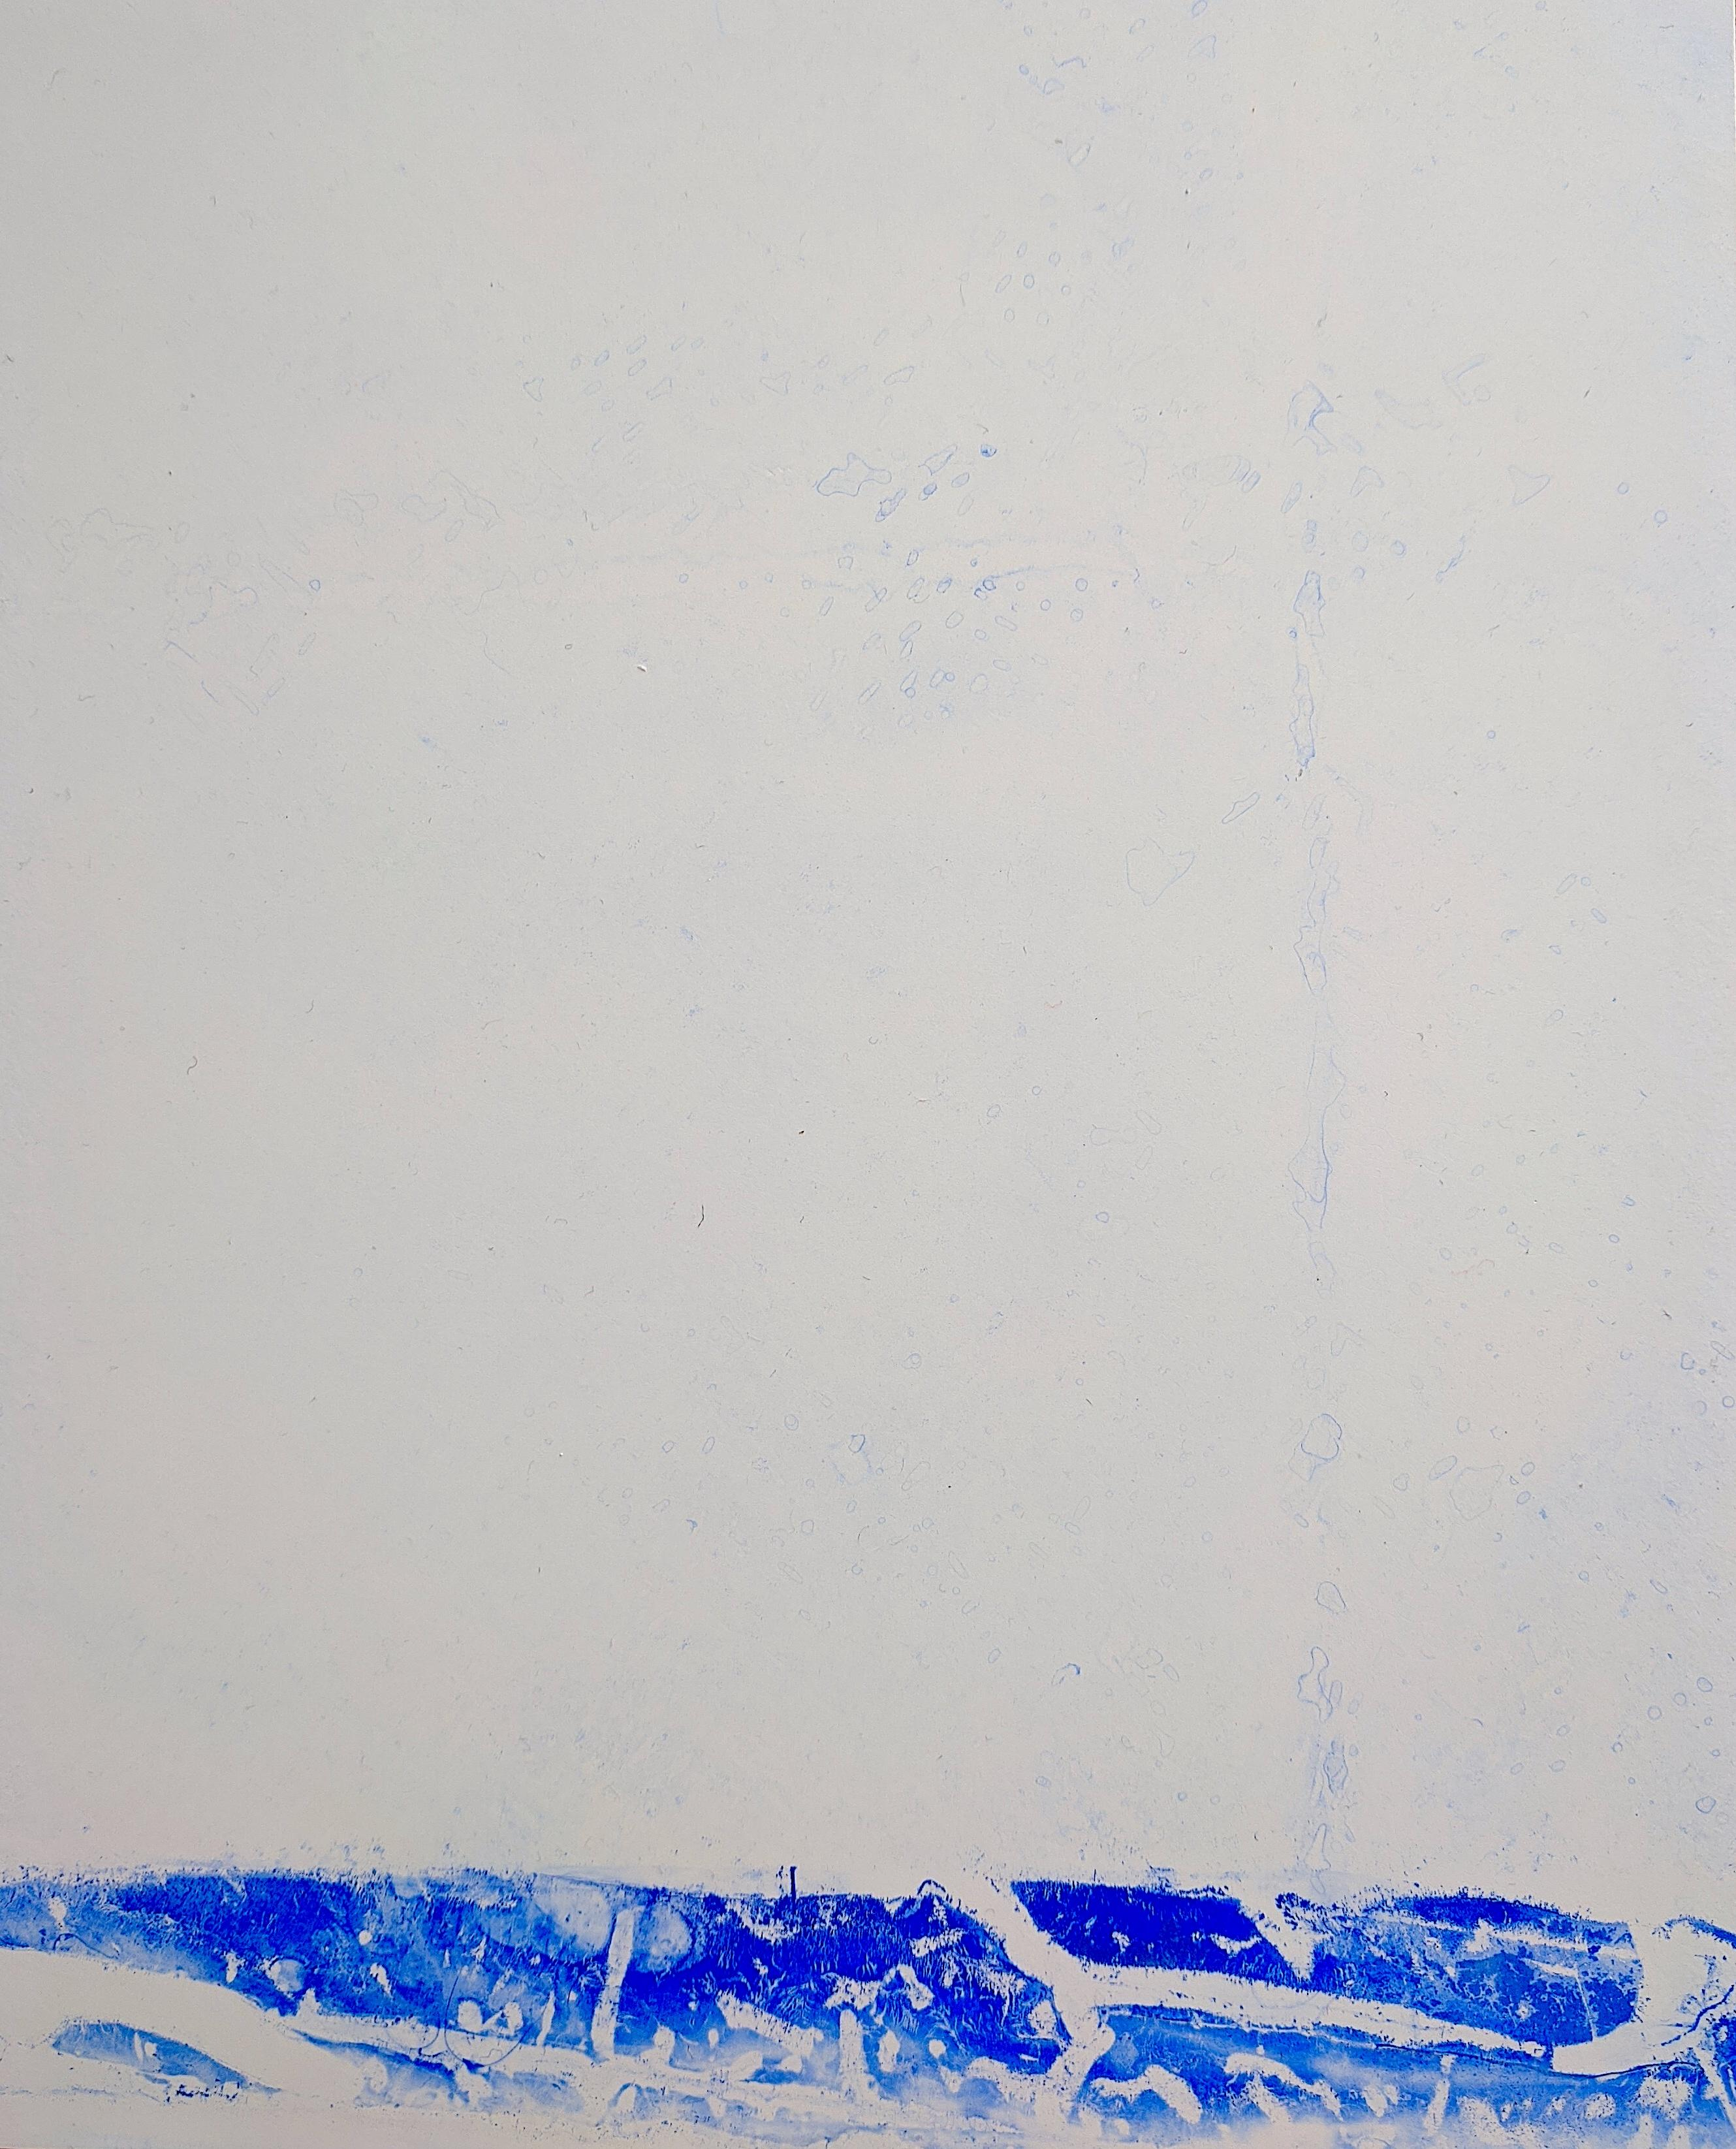 Ellen Hackl Fagan, Seeking the Sound of Cobalt Blue_North Country_2020_